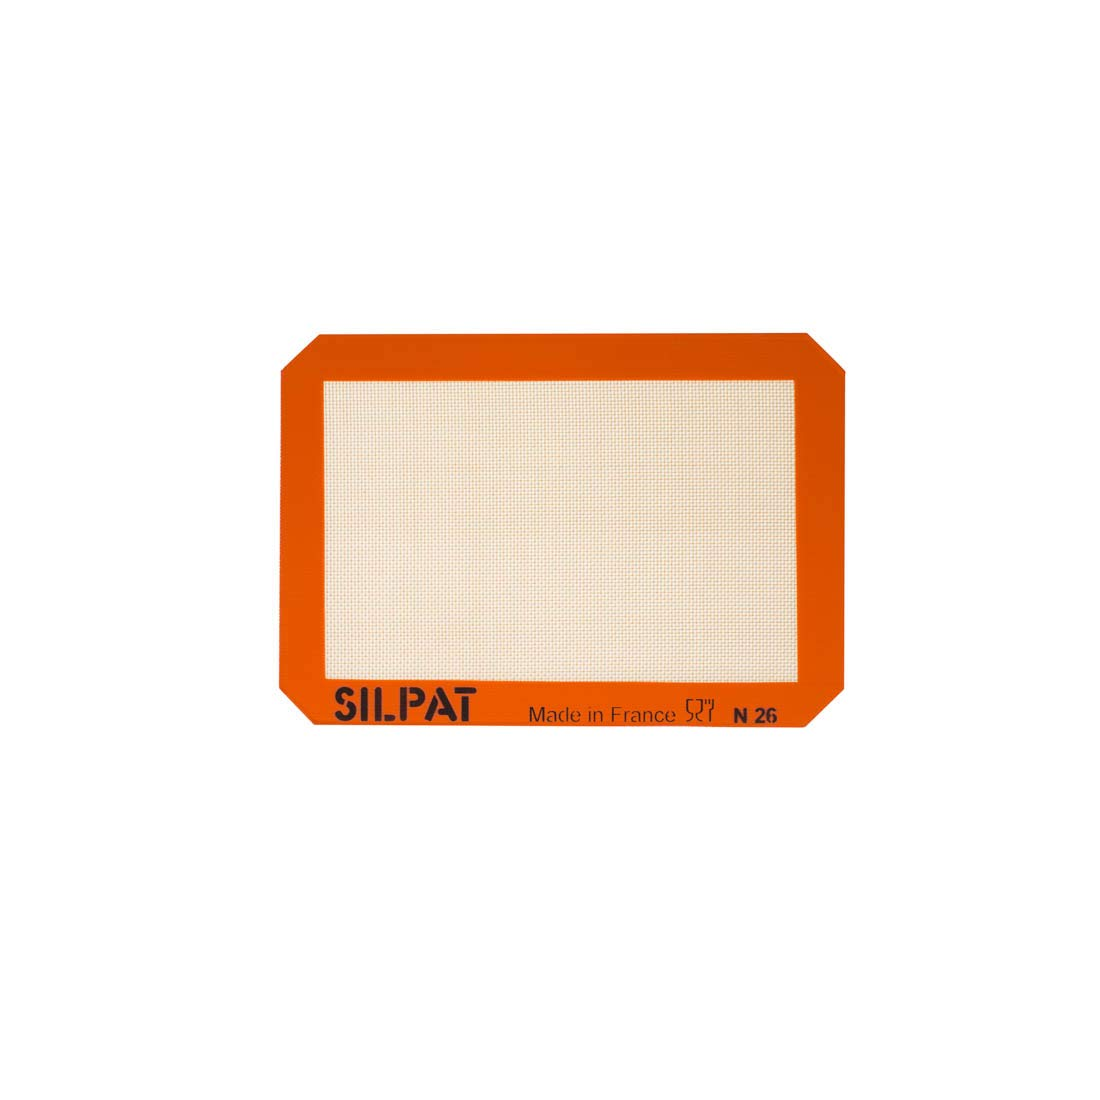 "Silpat AE295205-01 Premium Non-Stick Silicone Baking Mat, Petite Jelly Roll Size, 8-1/4"" x 11-3/4"""